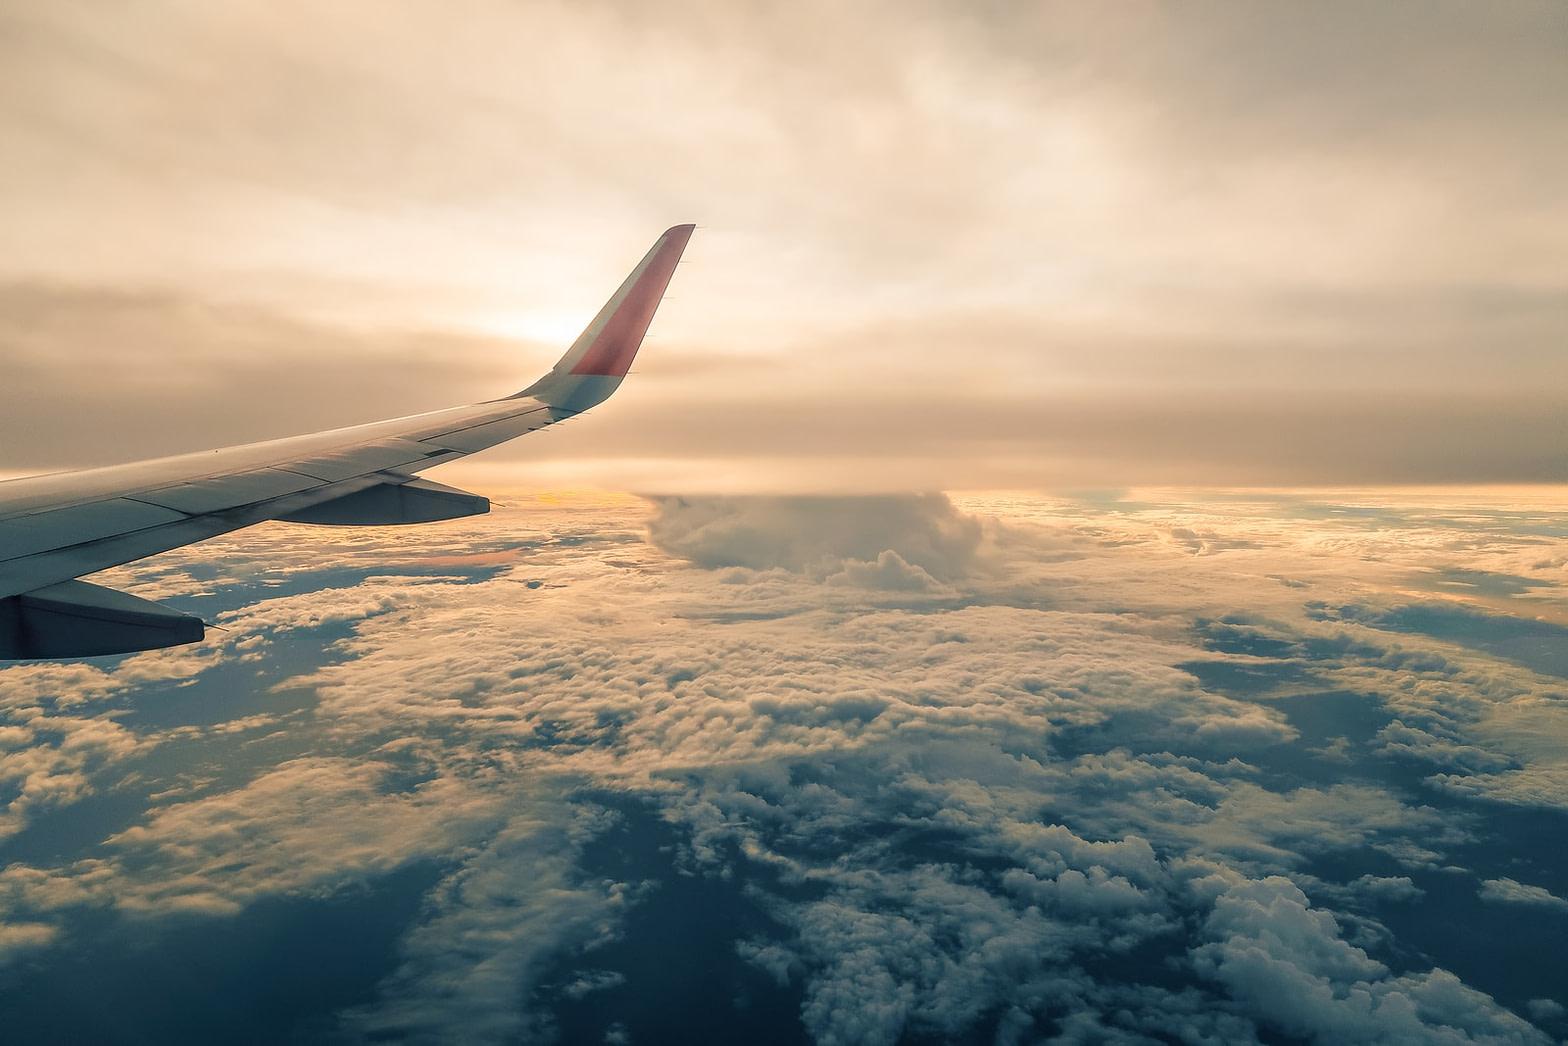 رحلات طيران كولومبو جدة CMB jED